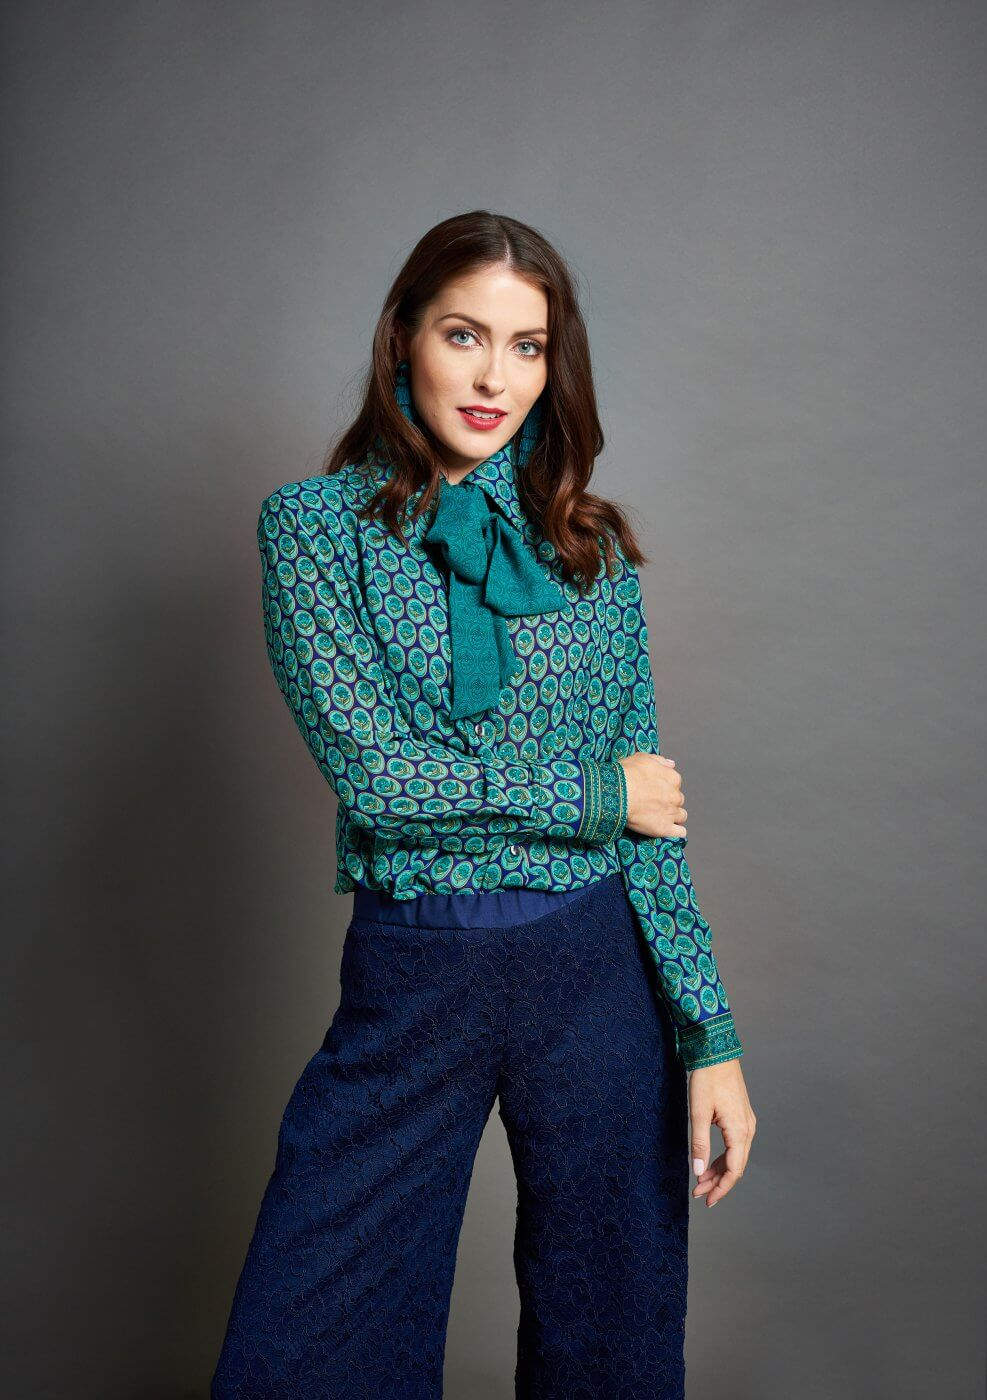 Women Modelling Bowtie Shirt   The Mustcard